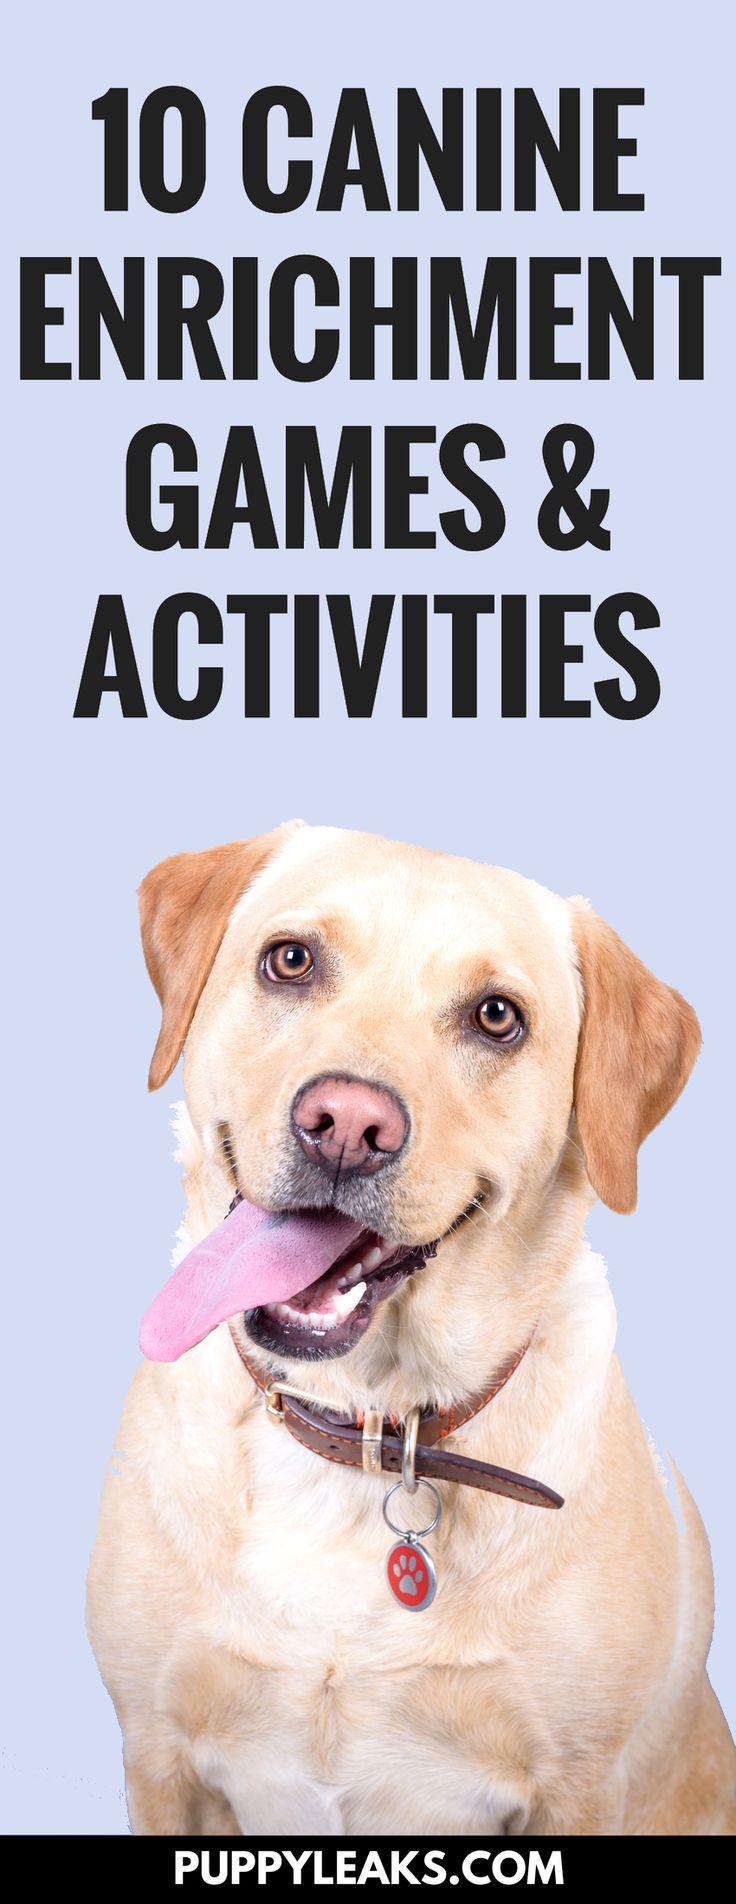 10 Canine Enrichment Games & Activities